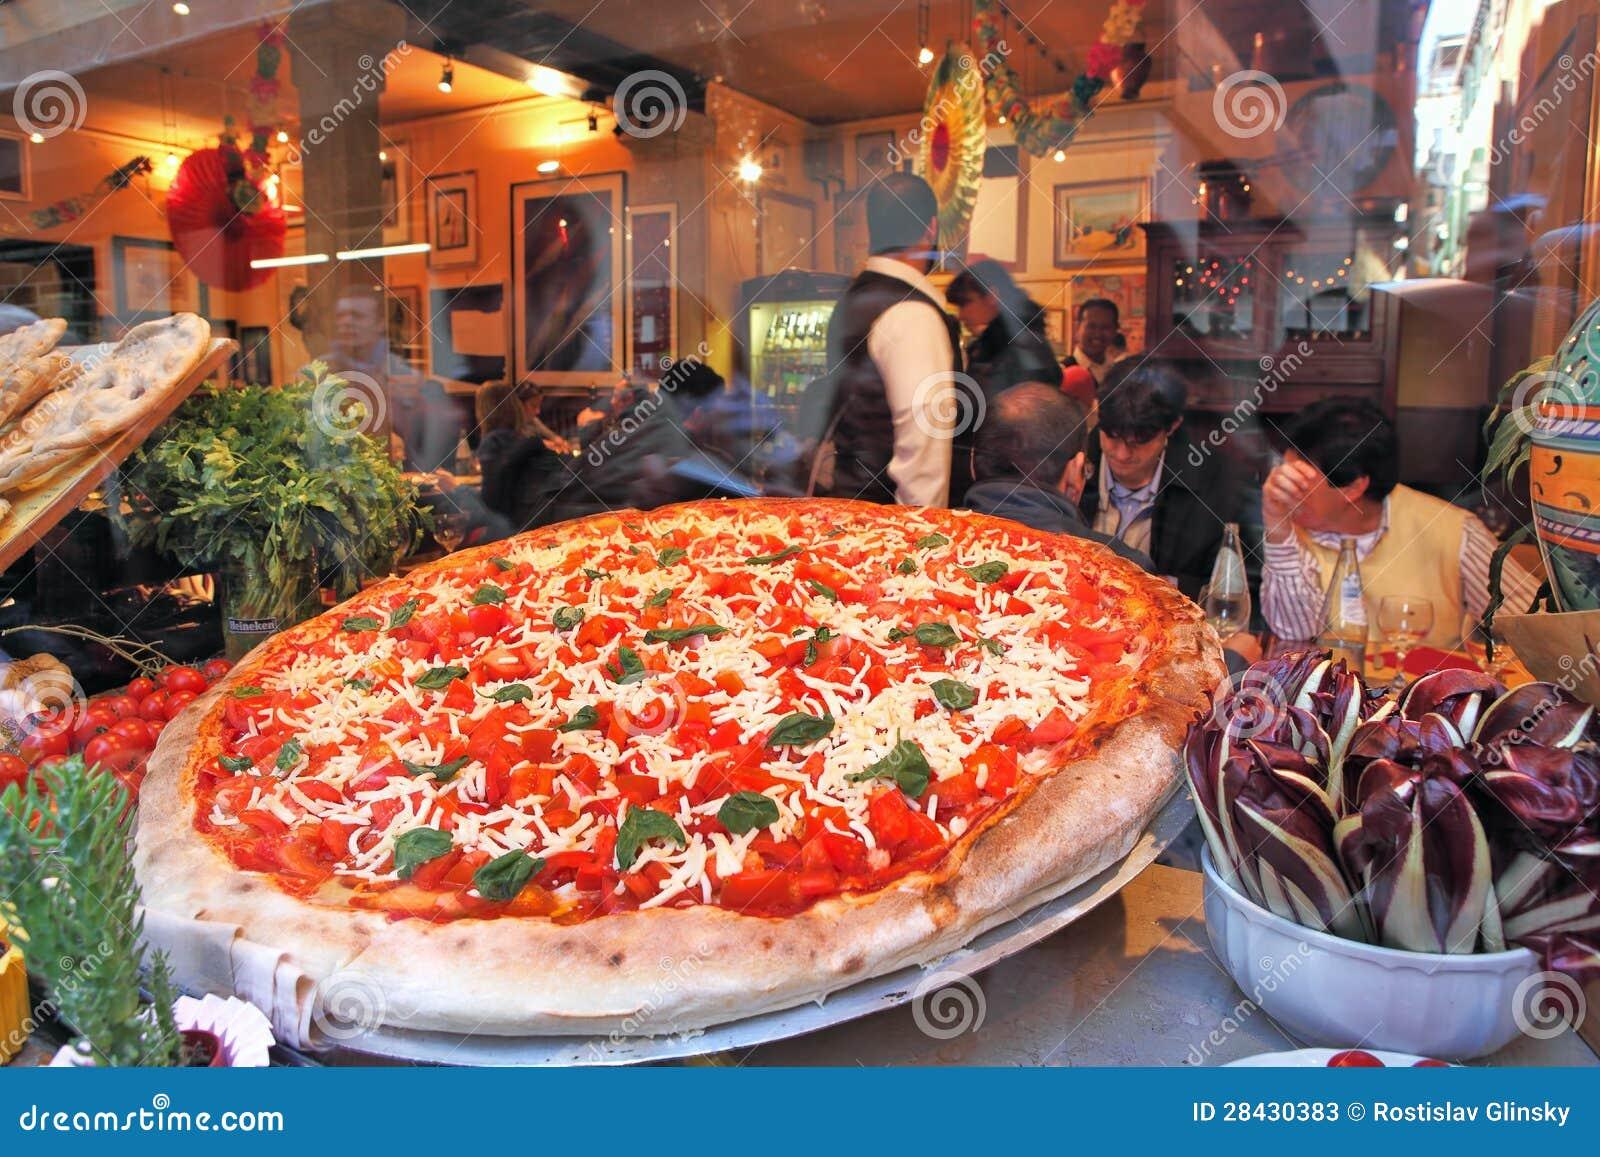 Best Italian Restaurants In San Antonio